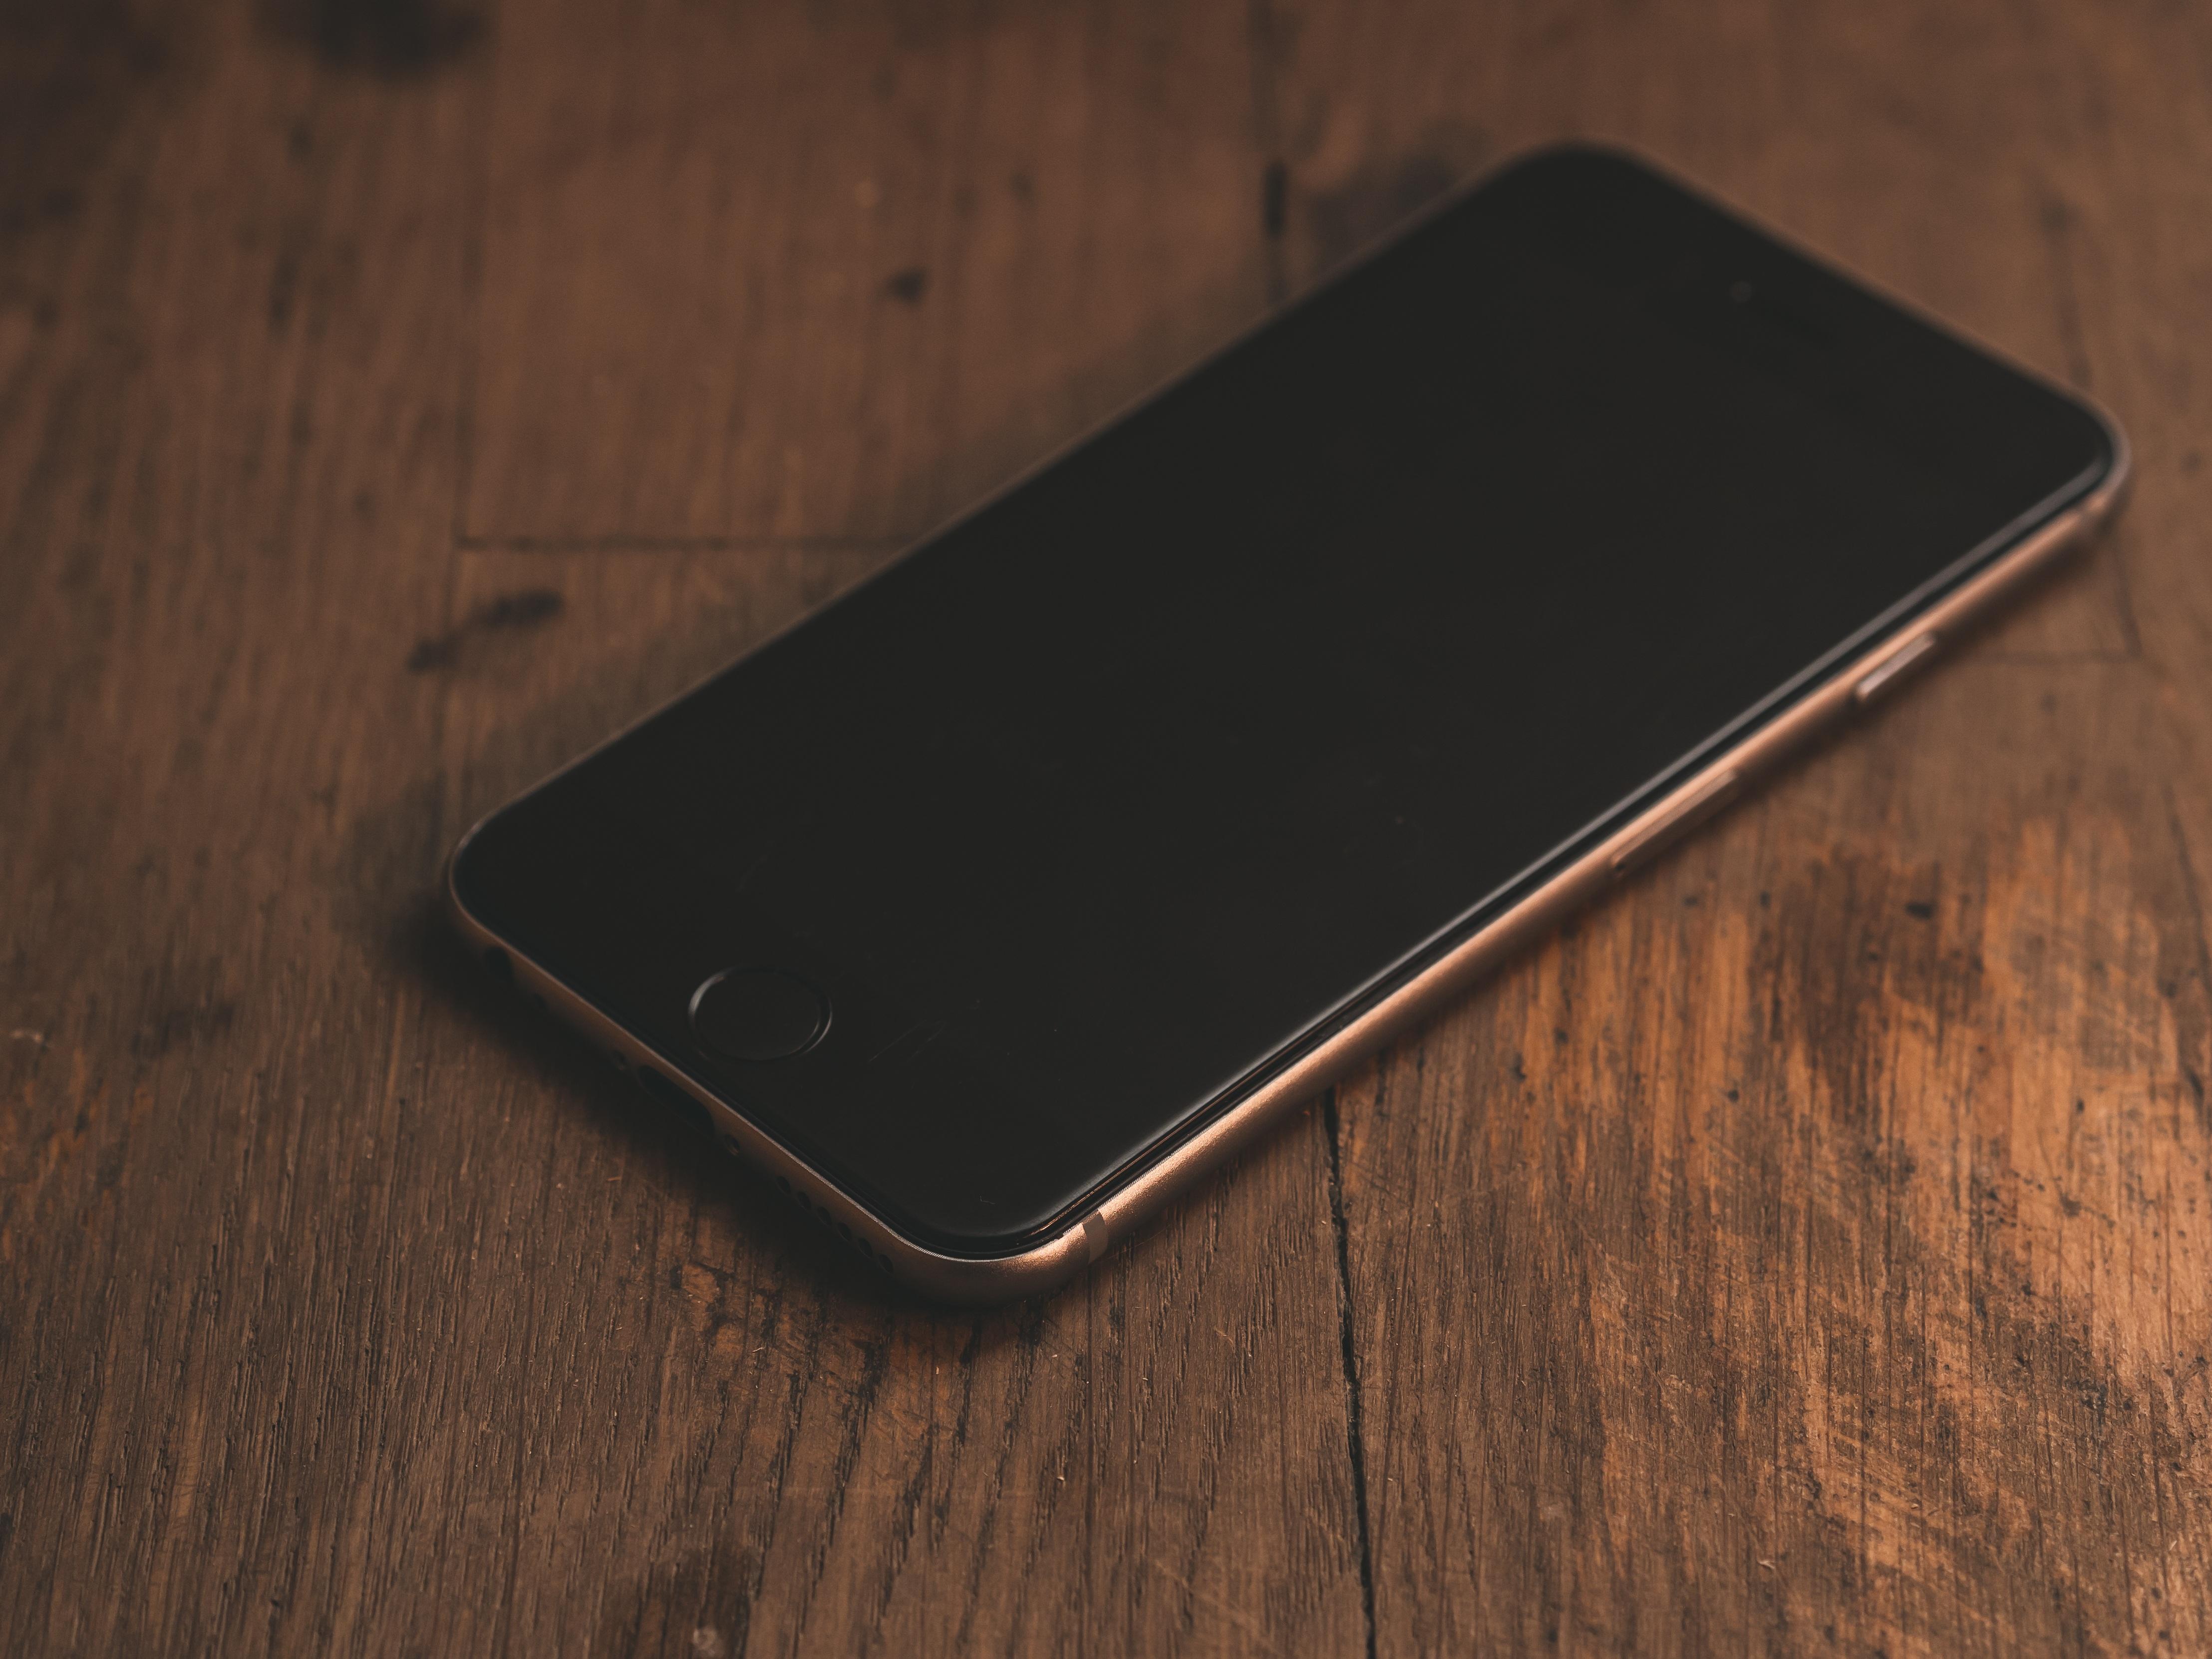 Fotos Gratis Iphone Escritorio Smartphone Pantalla